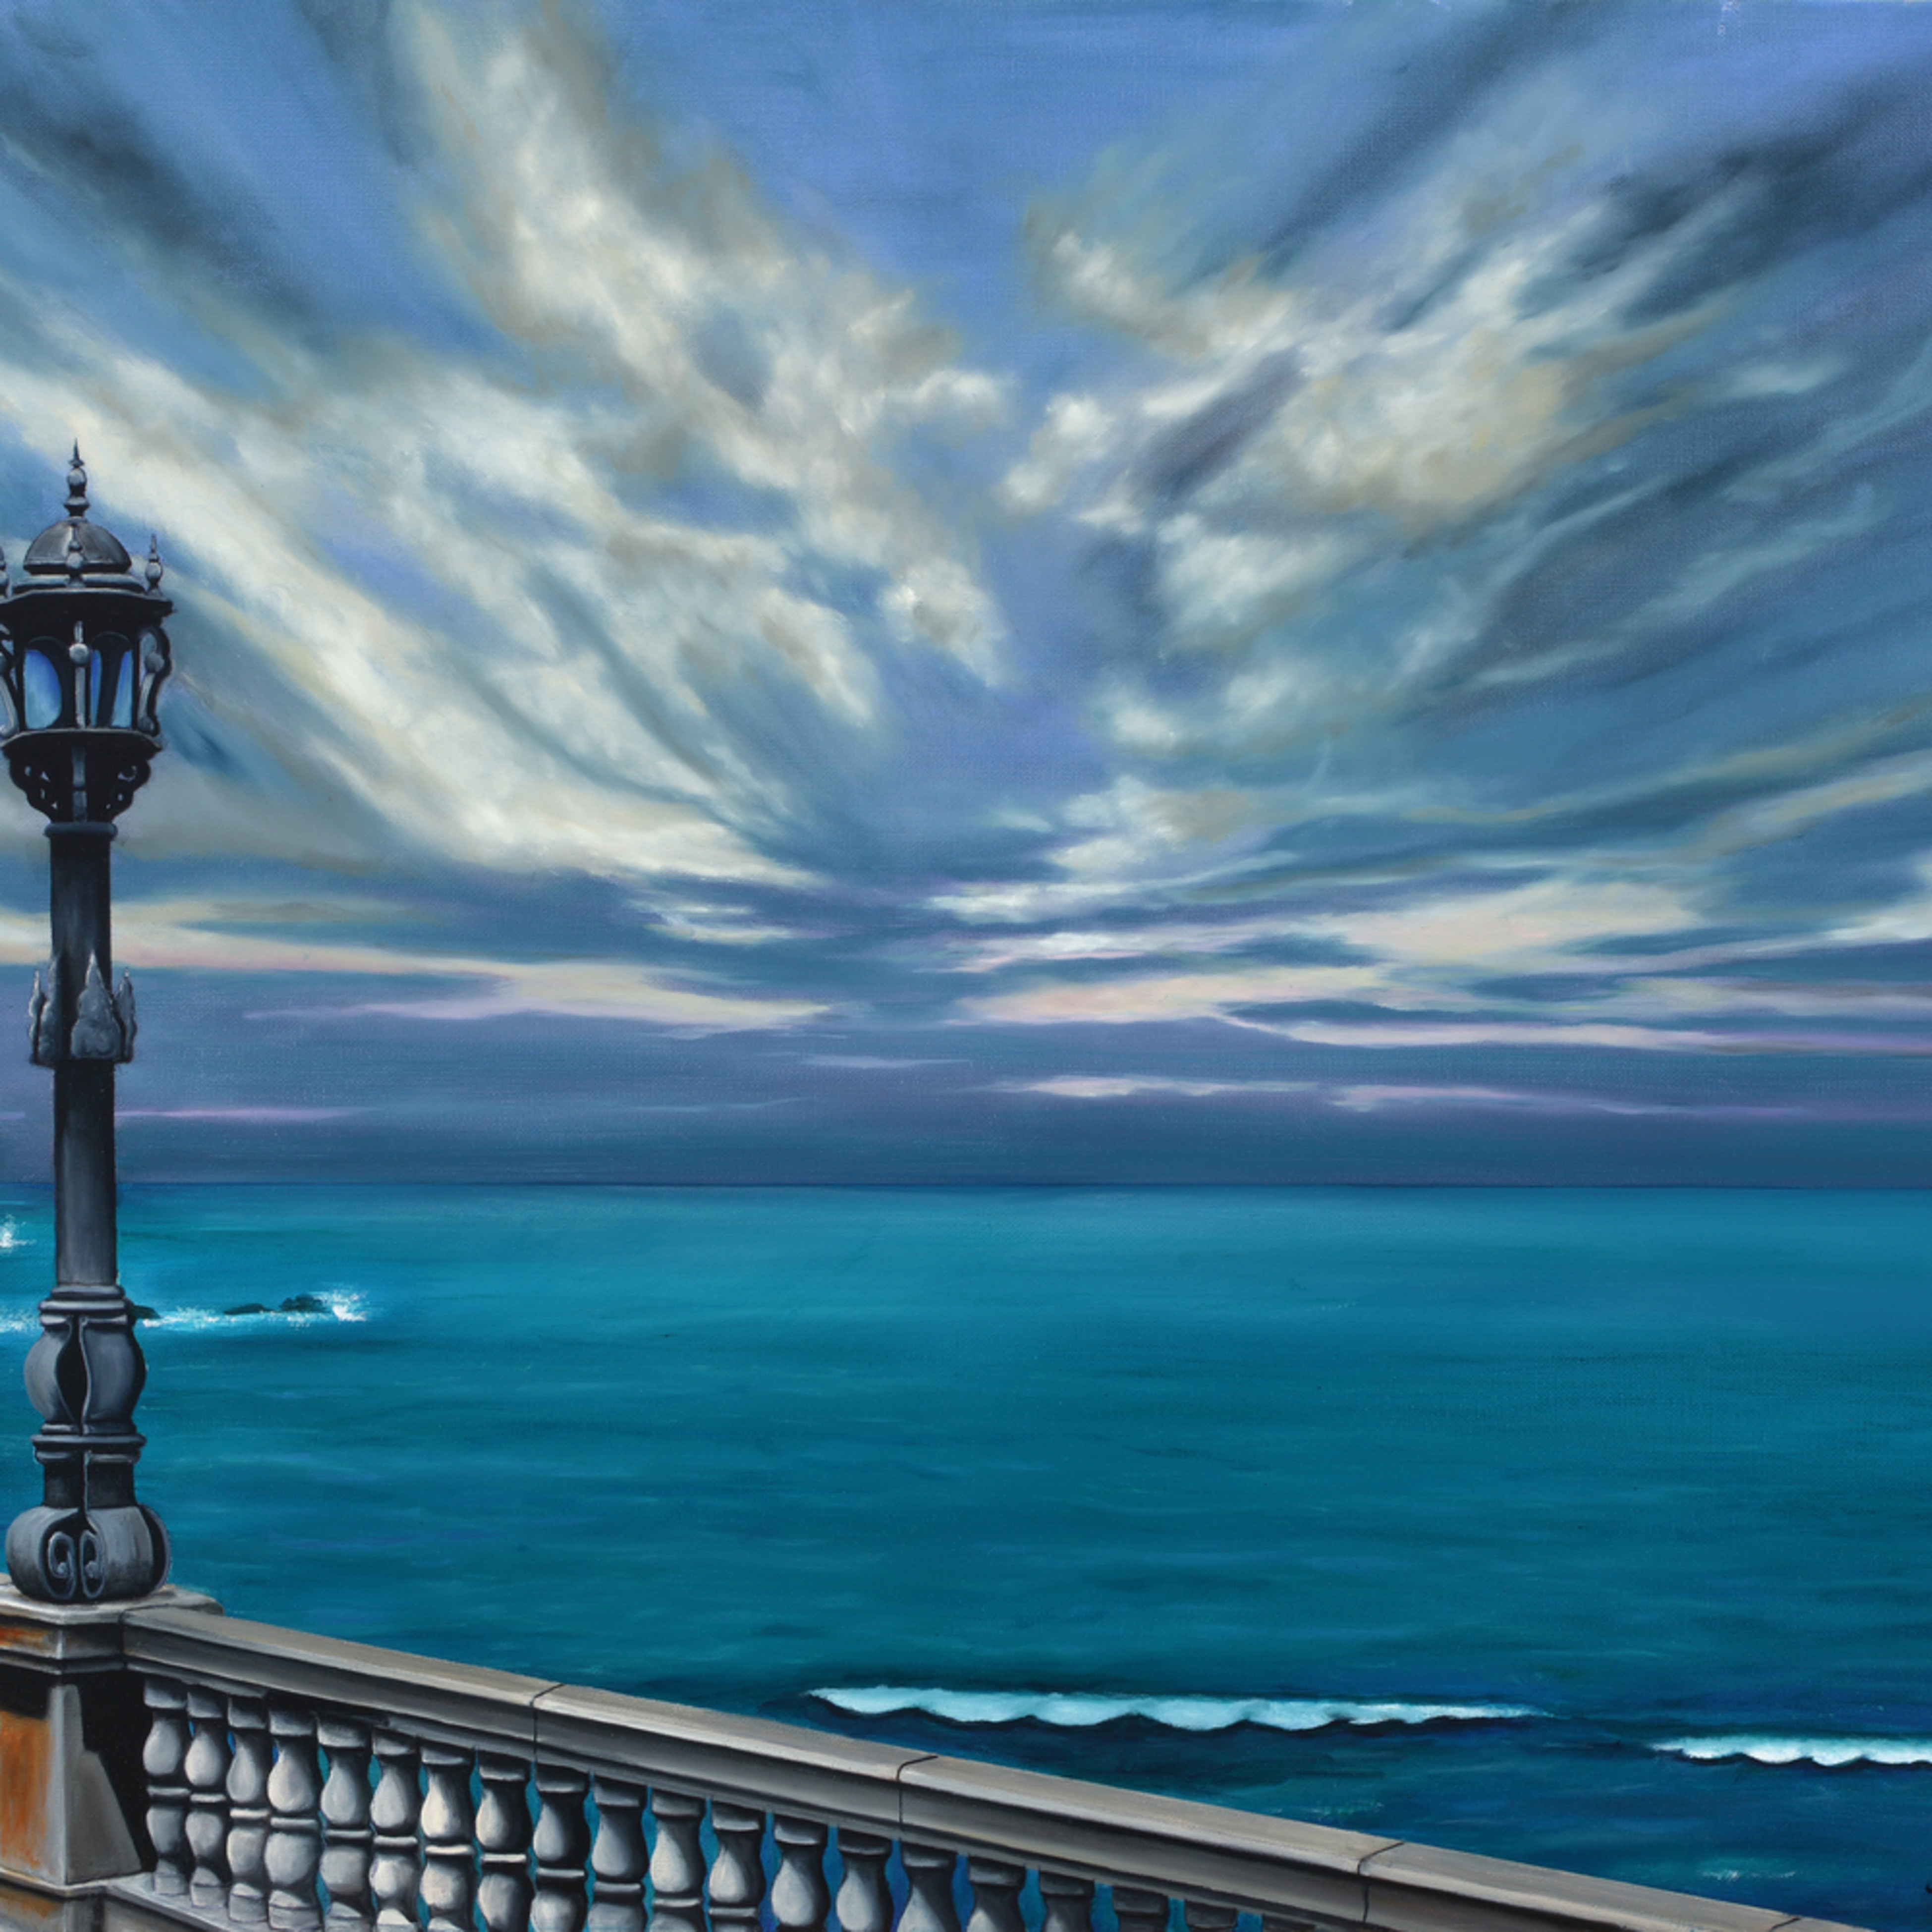 06  mediterranean sea walk oil on canvas by monica marquez gatica mmg art studio rdduw0